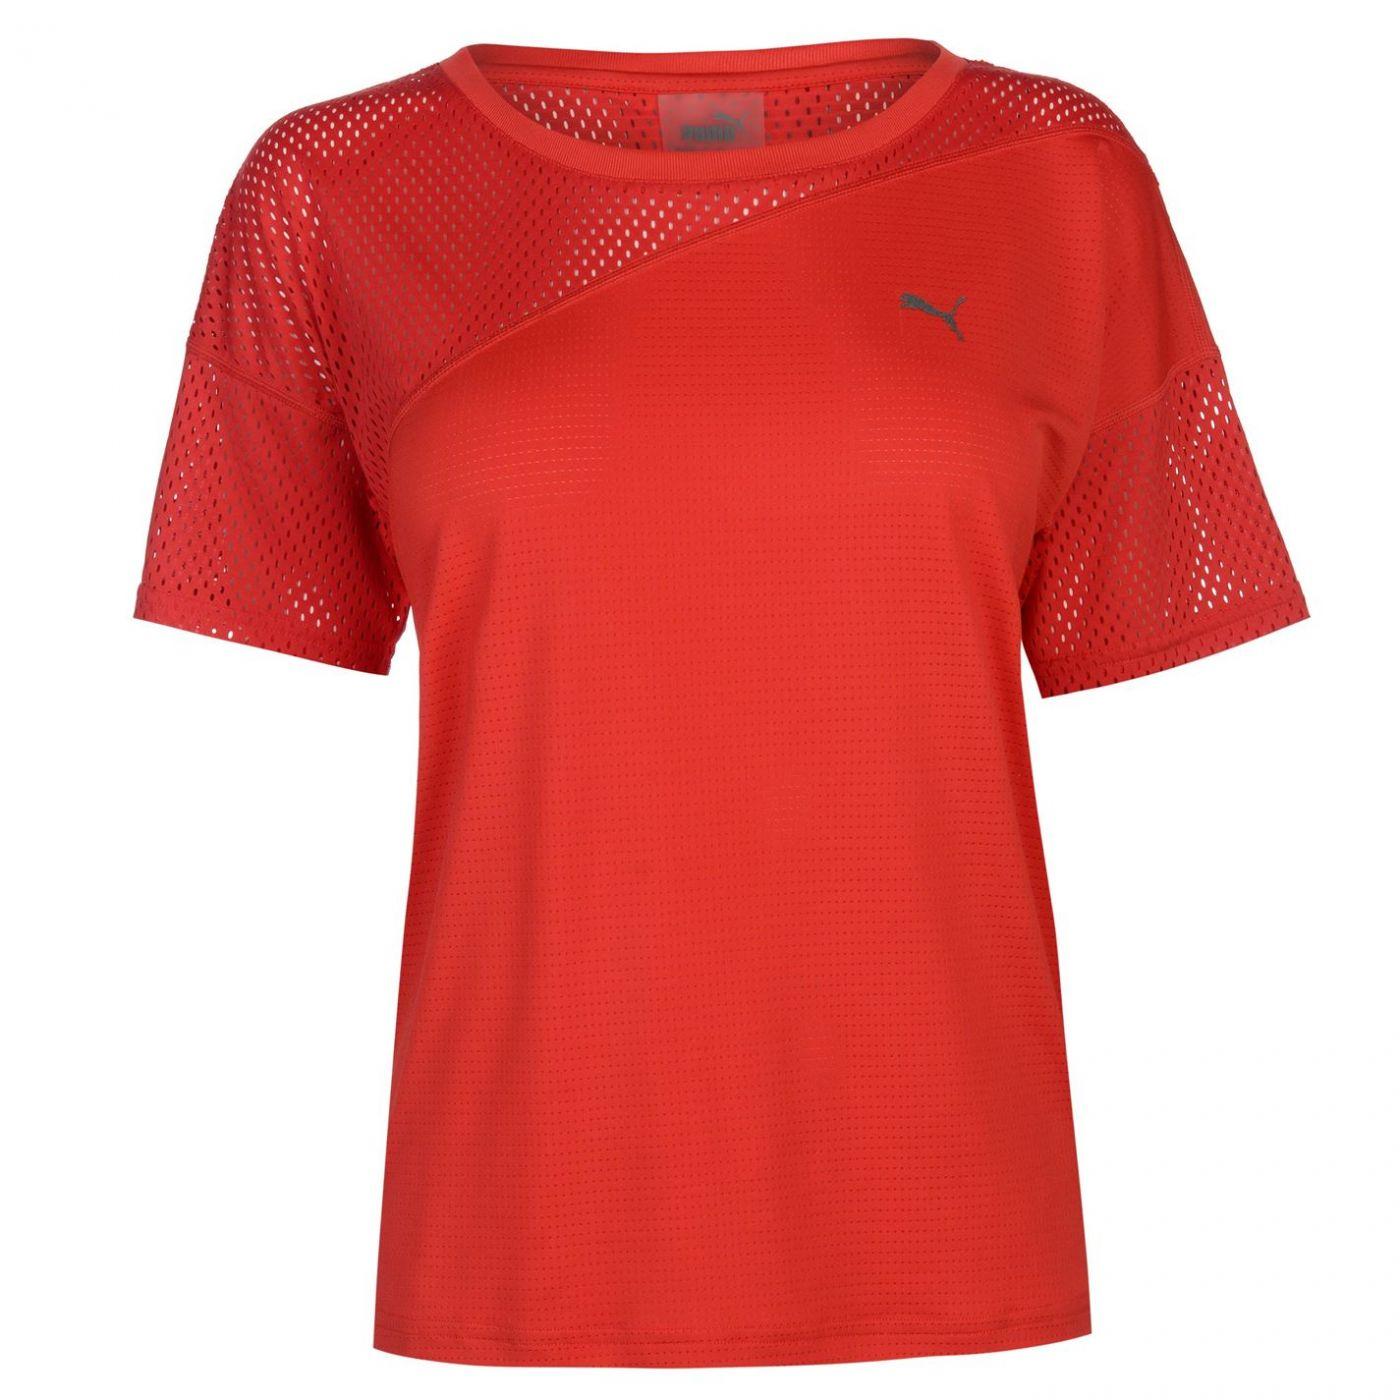 Triko Puma ACE Mesh T Shirt dámské